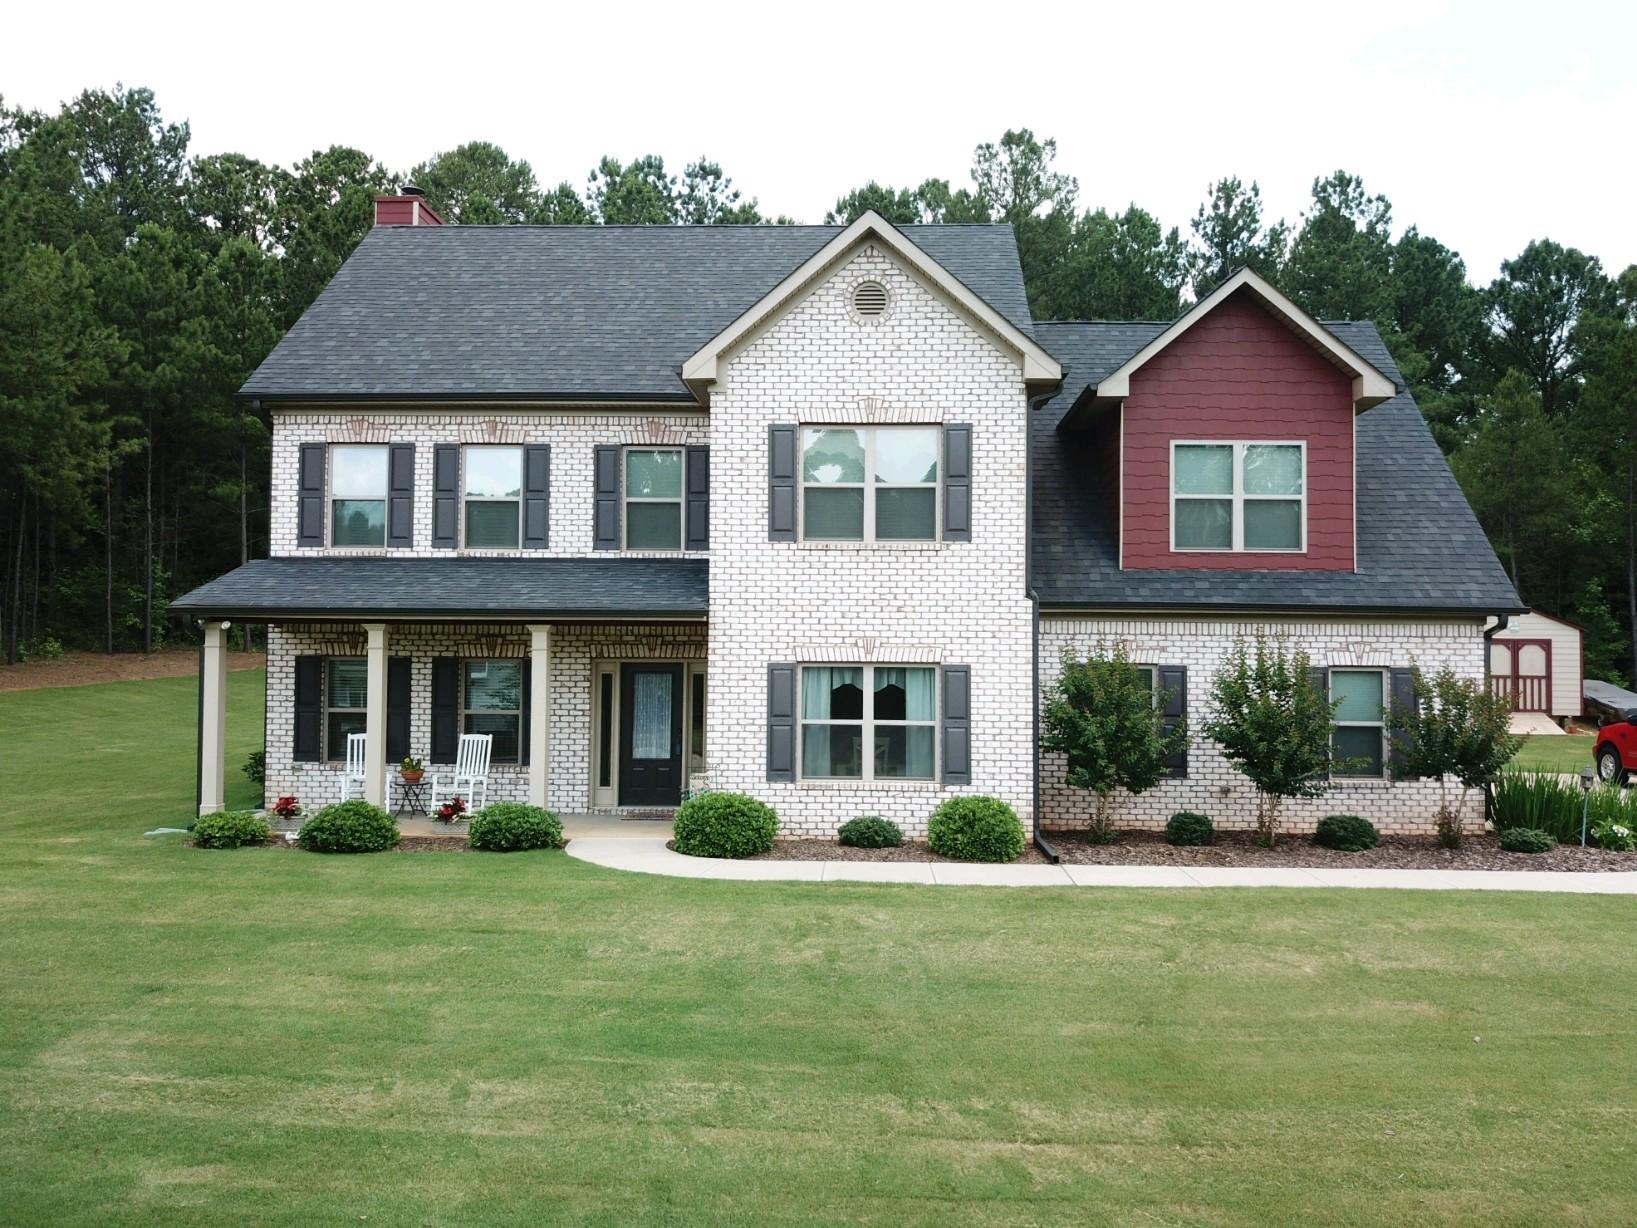 Lifeline Home Inspections - Brooks, GA